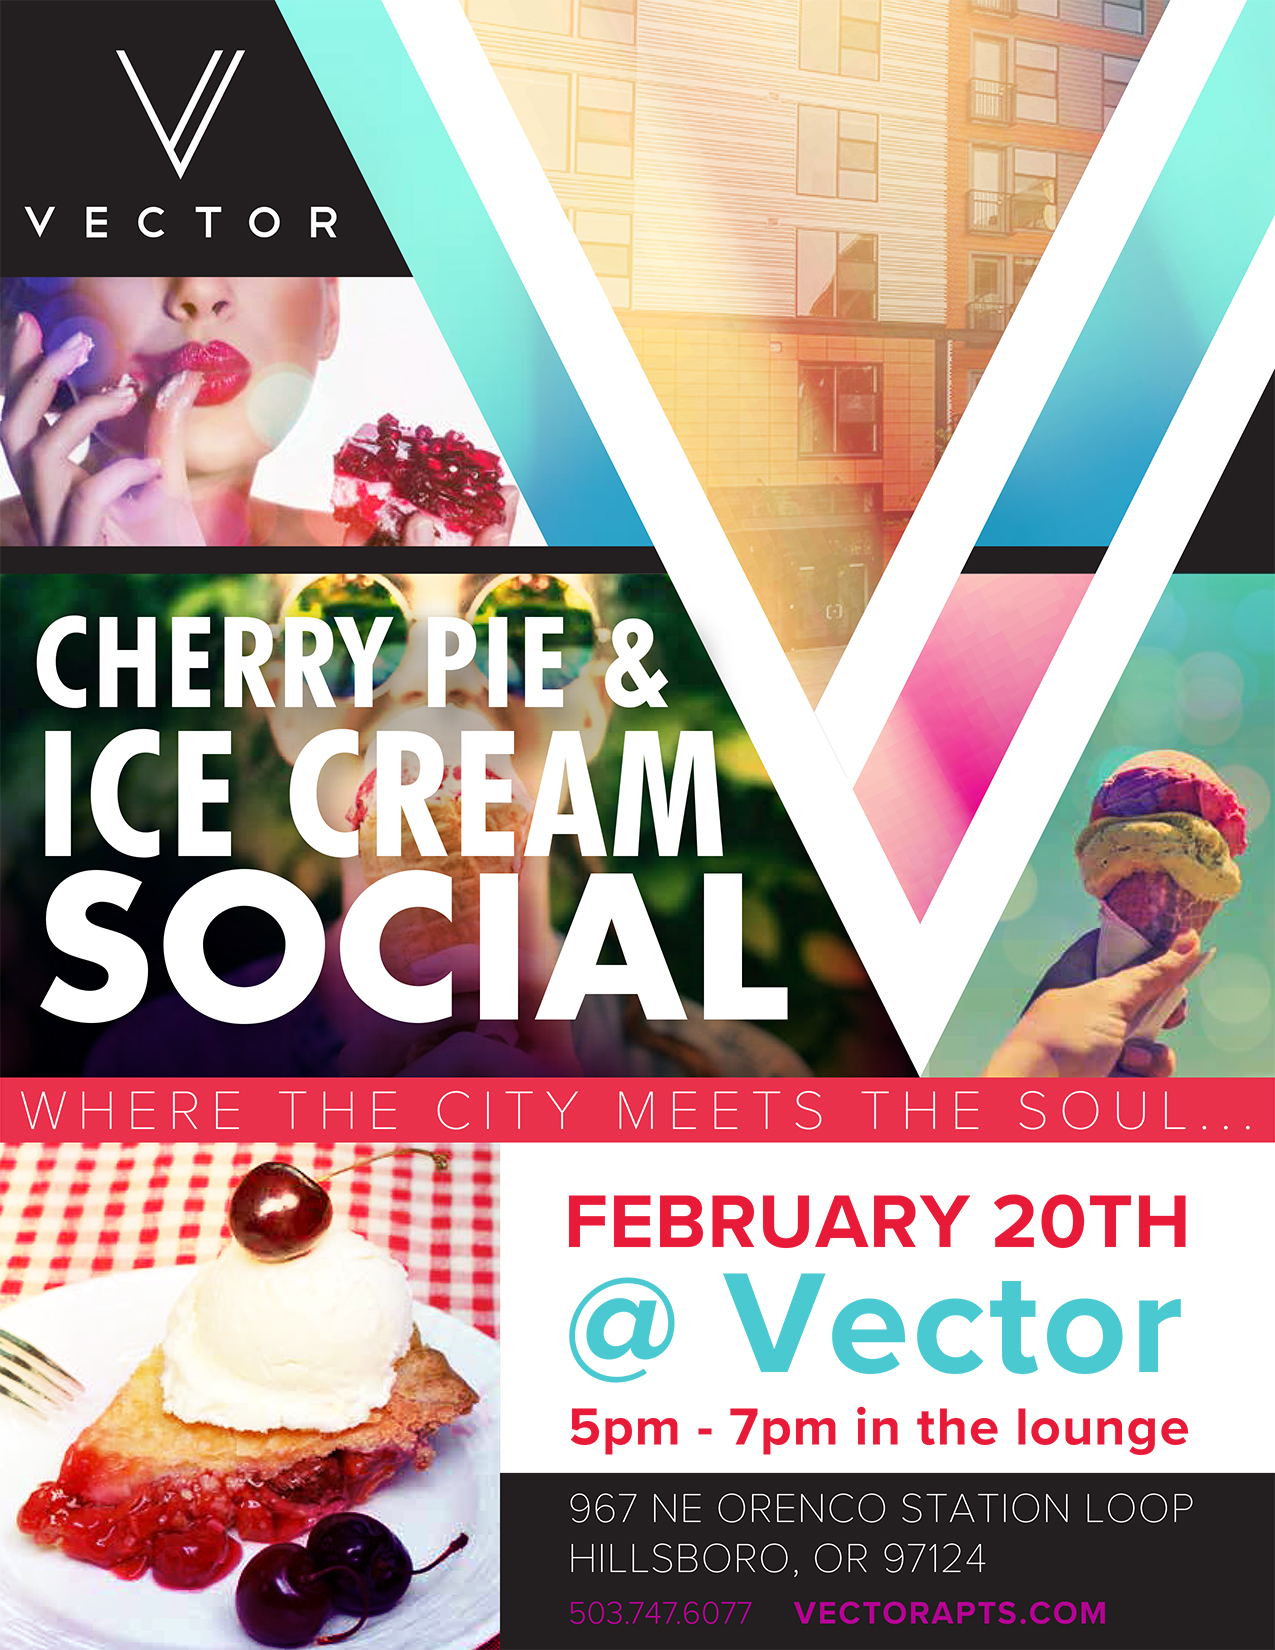 VECTOR_CherryPie-IceCream-Social_21517.jpg